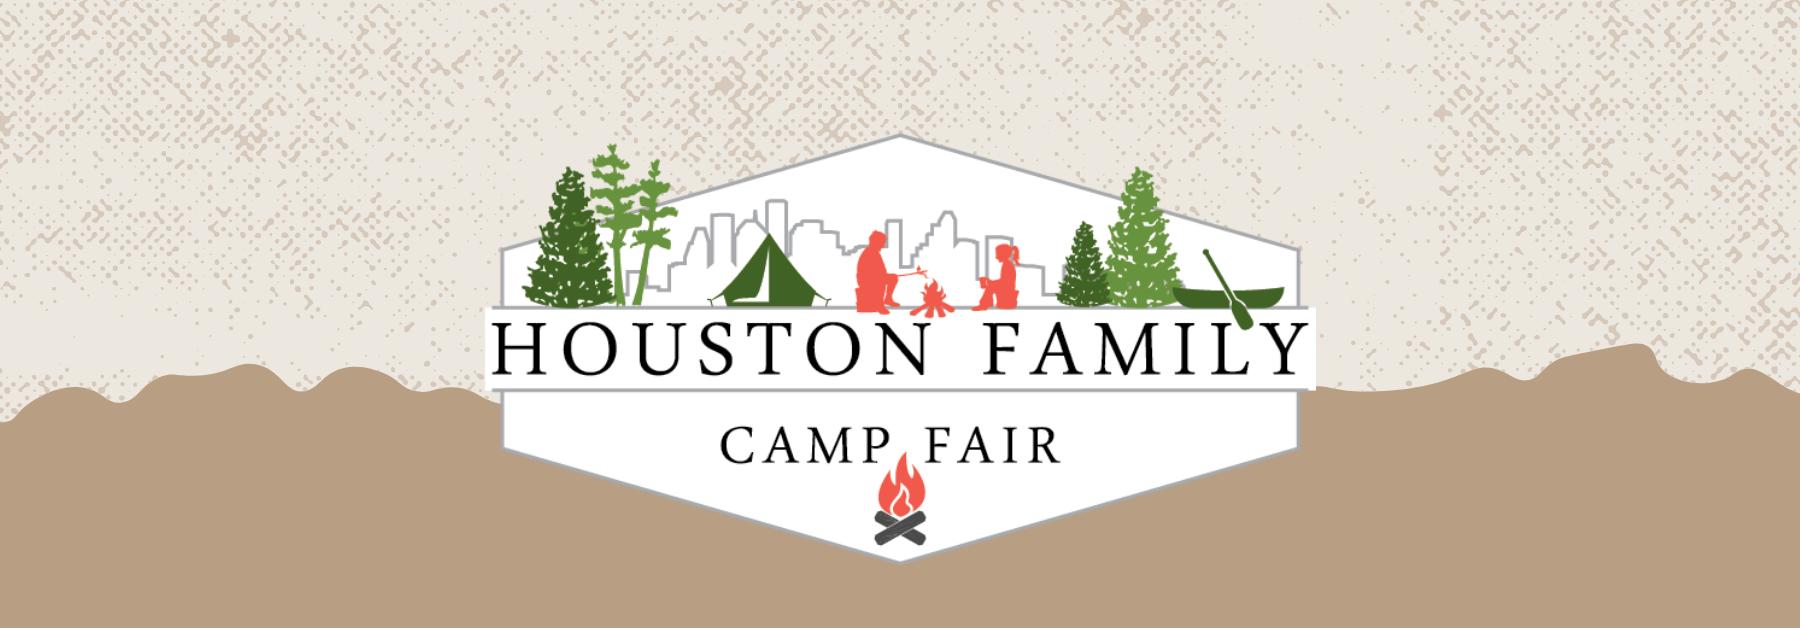 Copy of ENews Virtual Camp Fair